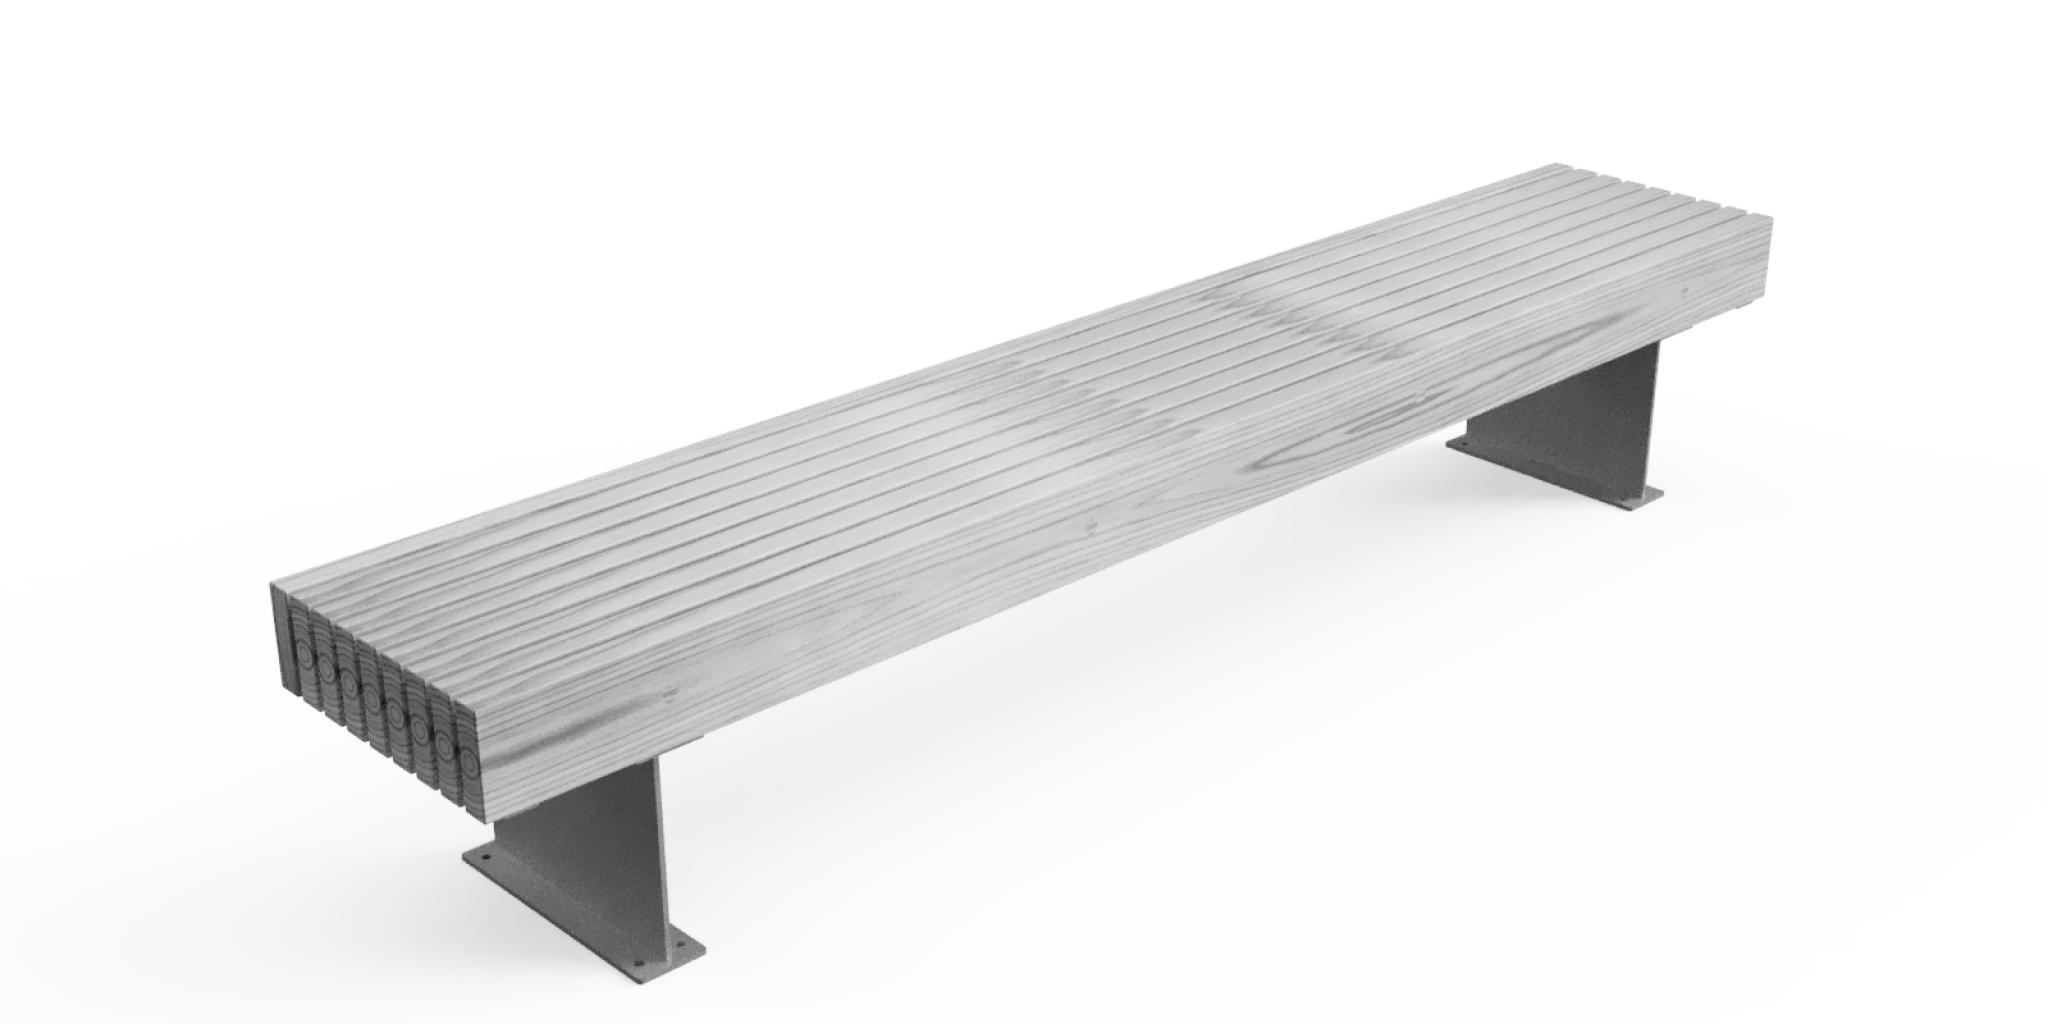 Stafford Timber Bench | Logic Street Scene